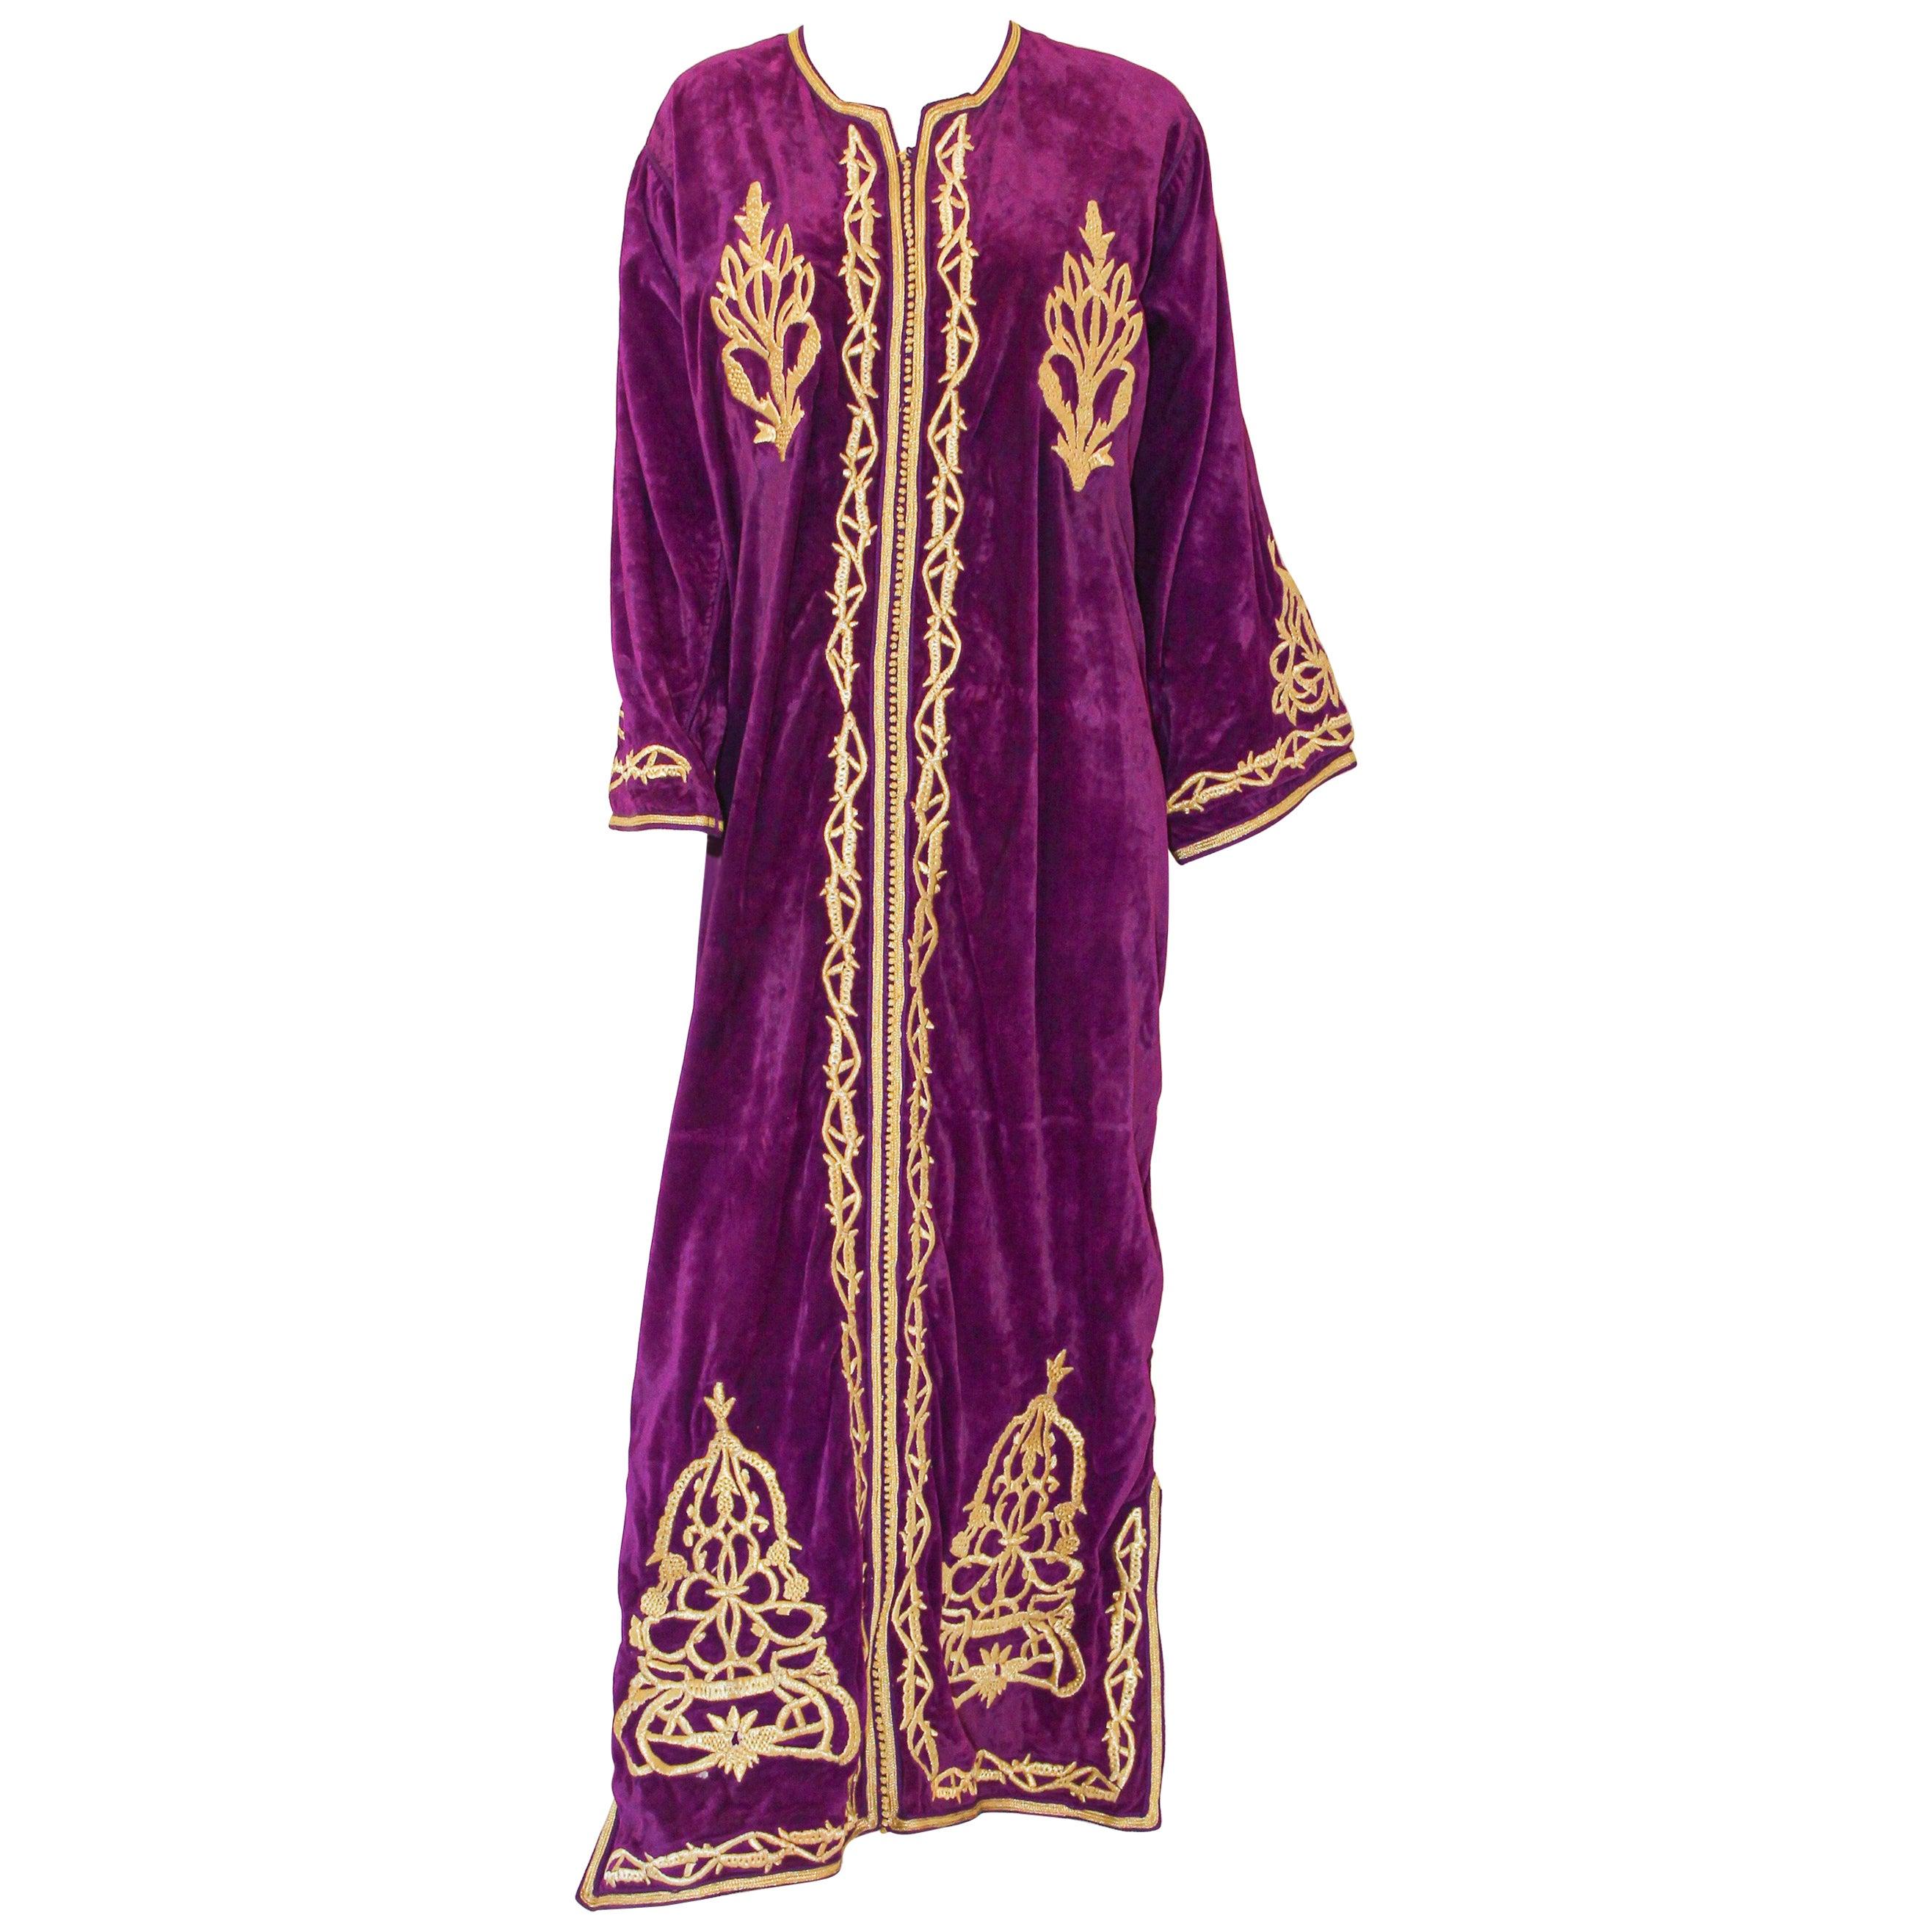 Moroccan Caftan Purple Velvet Embroidered with Gold Kaftan, circa 1970